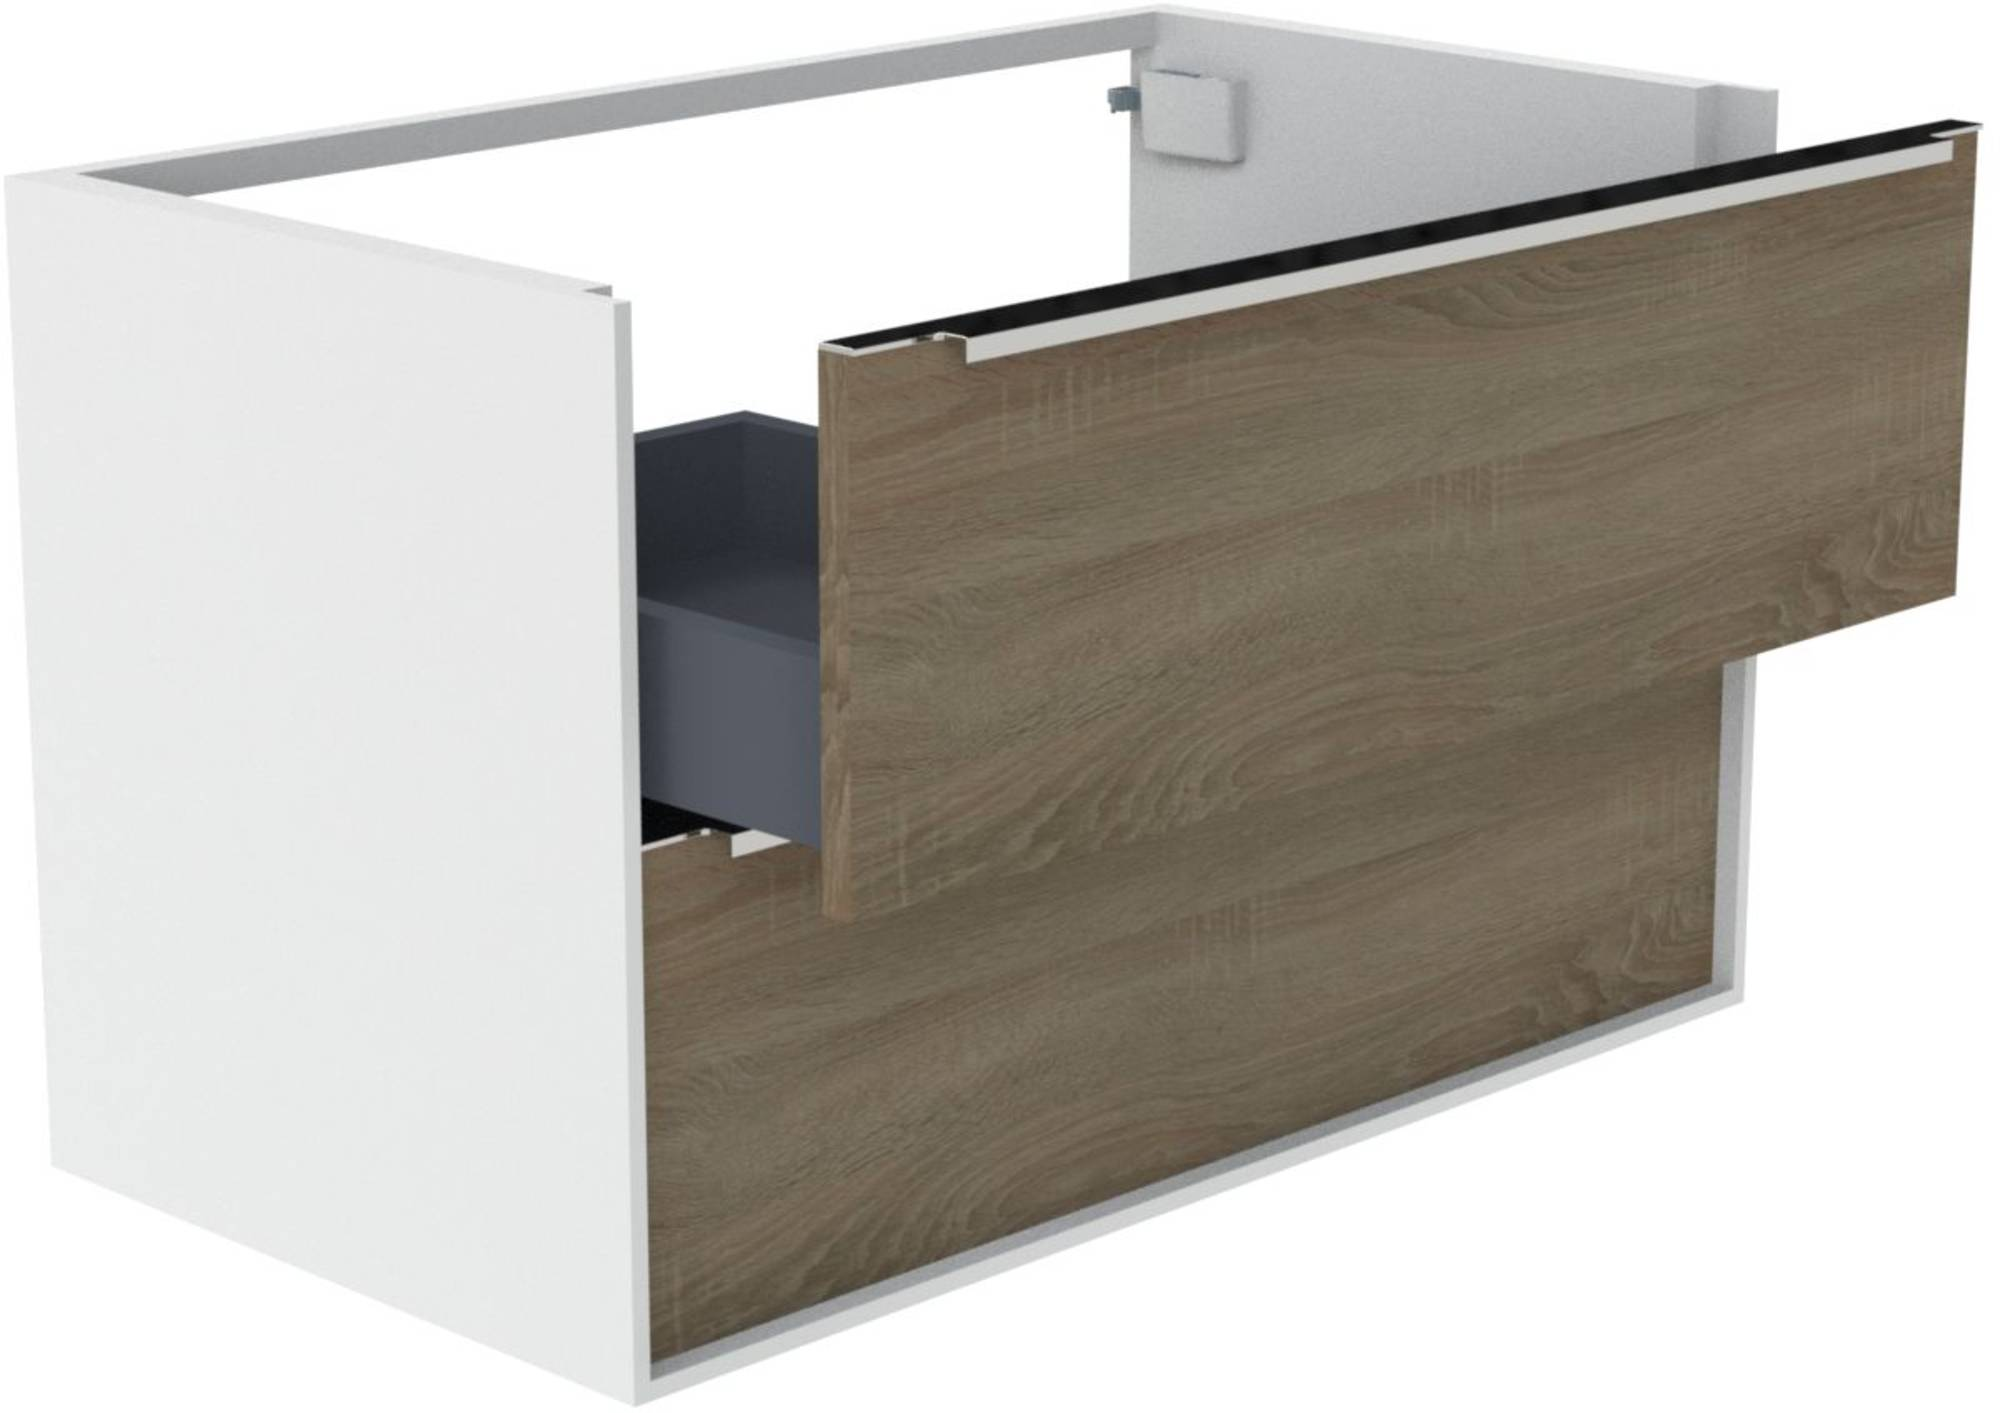 Thebalux Sense Wastafelonderkast 82x44,5x50 cm Nebraska Eiken